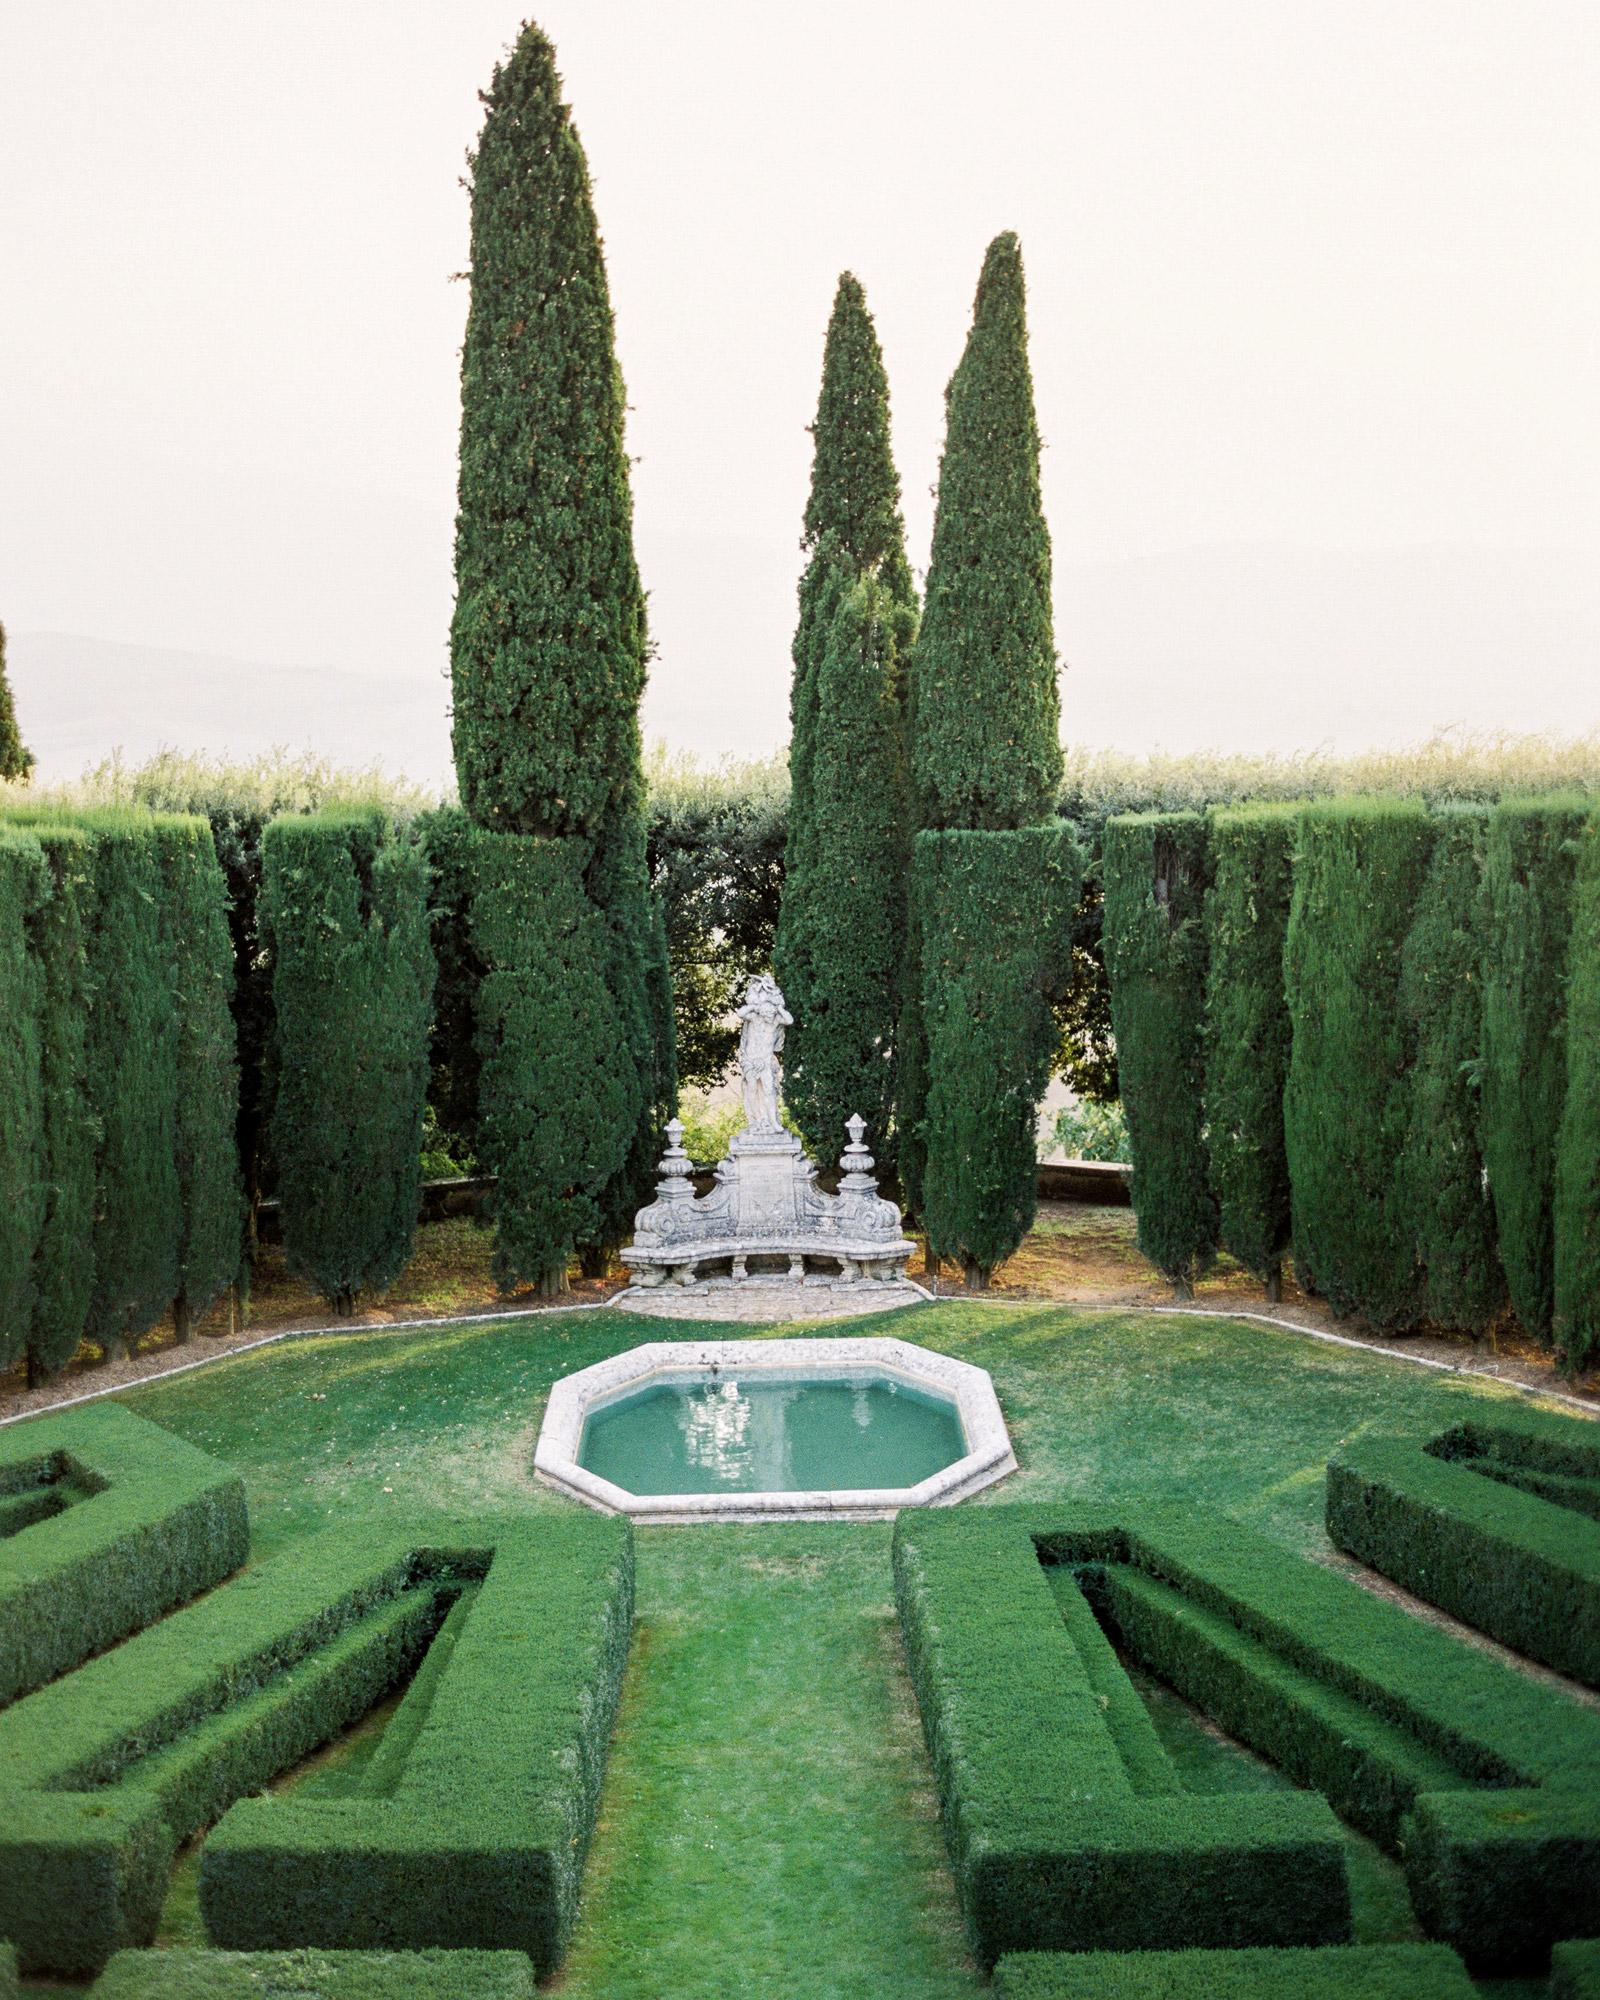 christine-dagan-wedding-maze-4278_07-s113011-0616.jpg